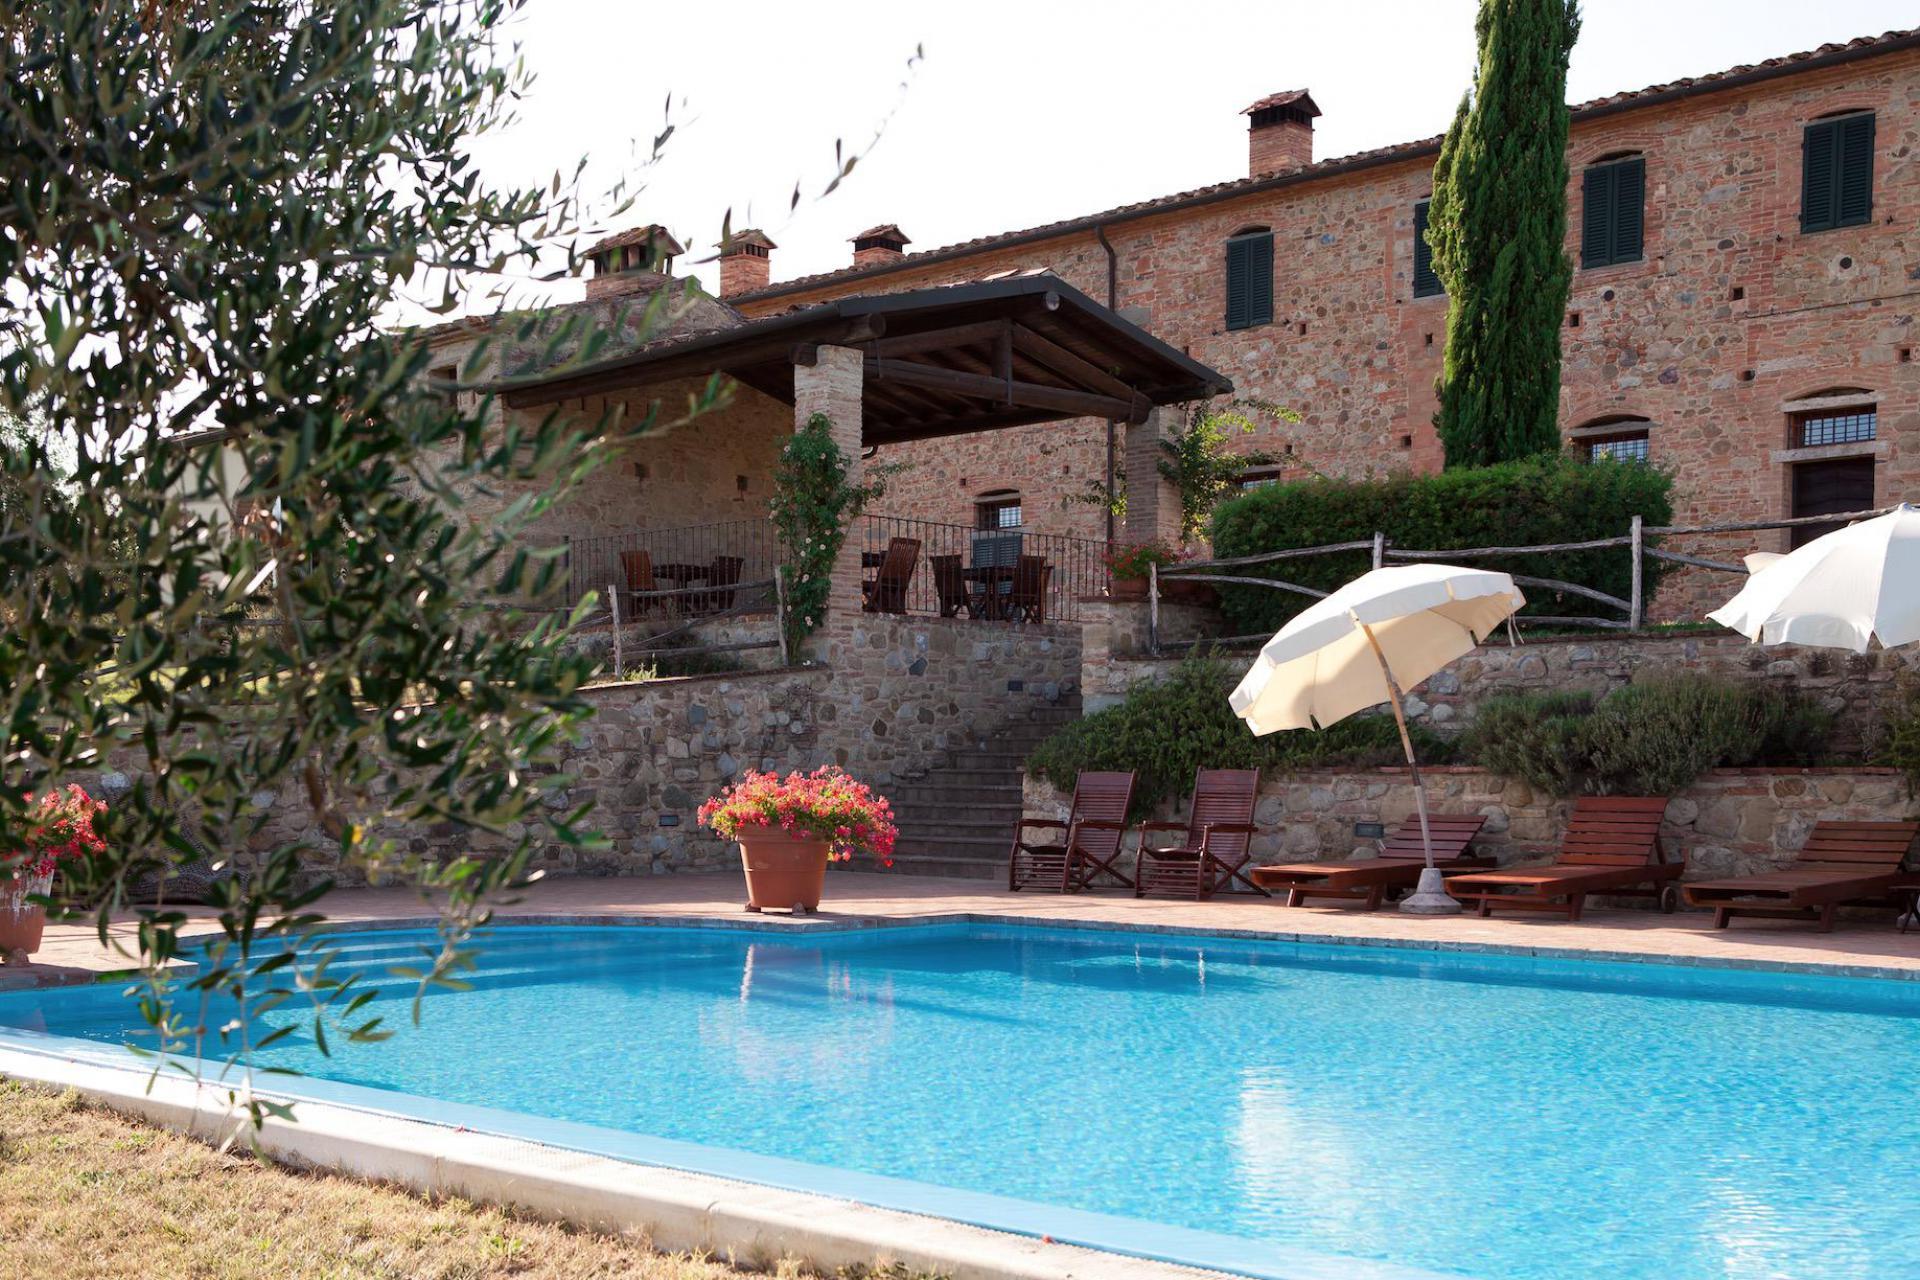 Agriturismo Toscana Agriturismo bilogico vicino a Montepulciano in Toscana